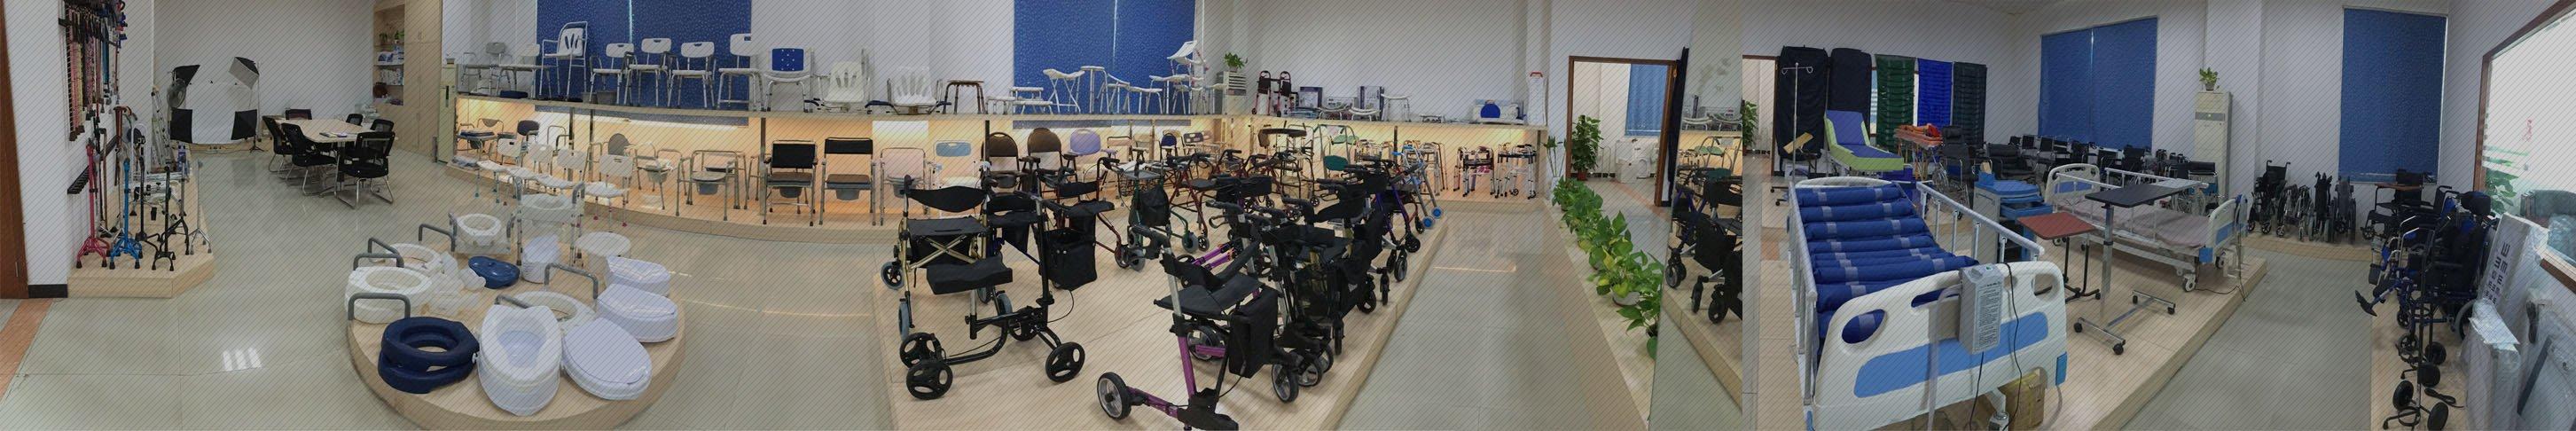 Best Manufacturing Of Medical Handicap Equipment Video -SCIENCE MEDICAL